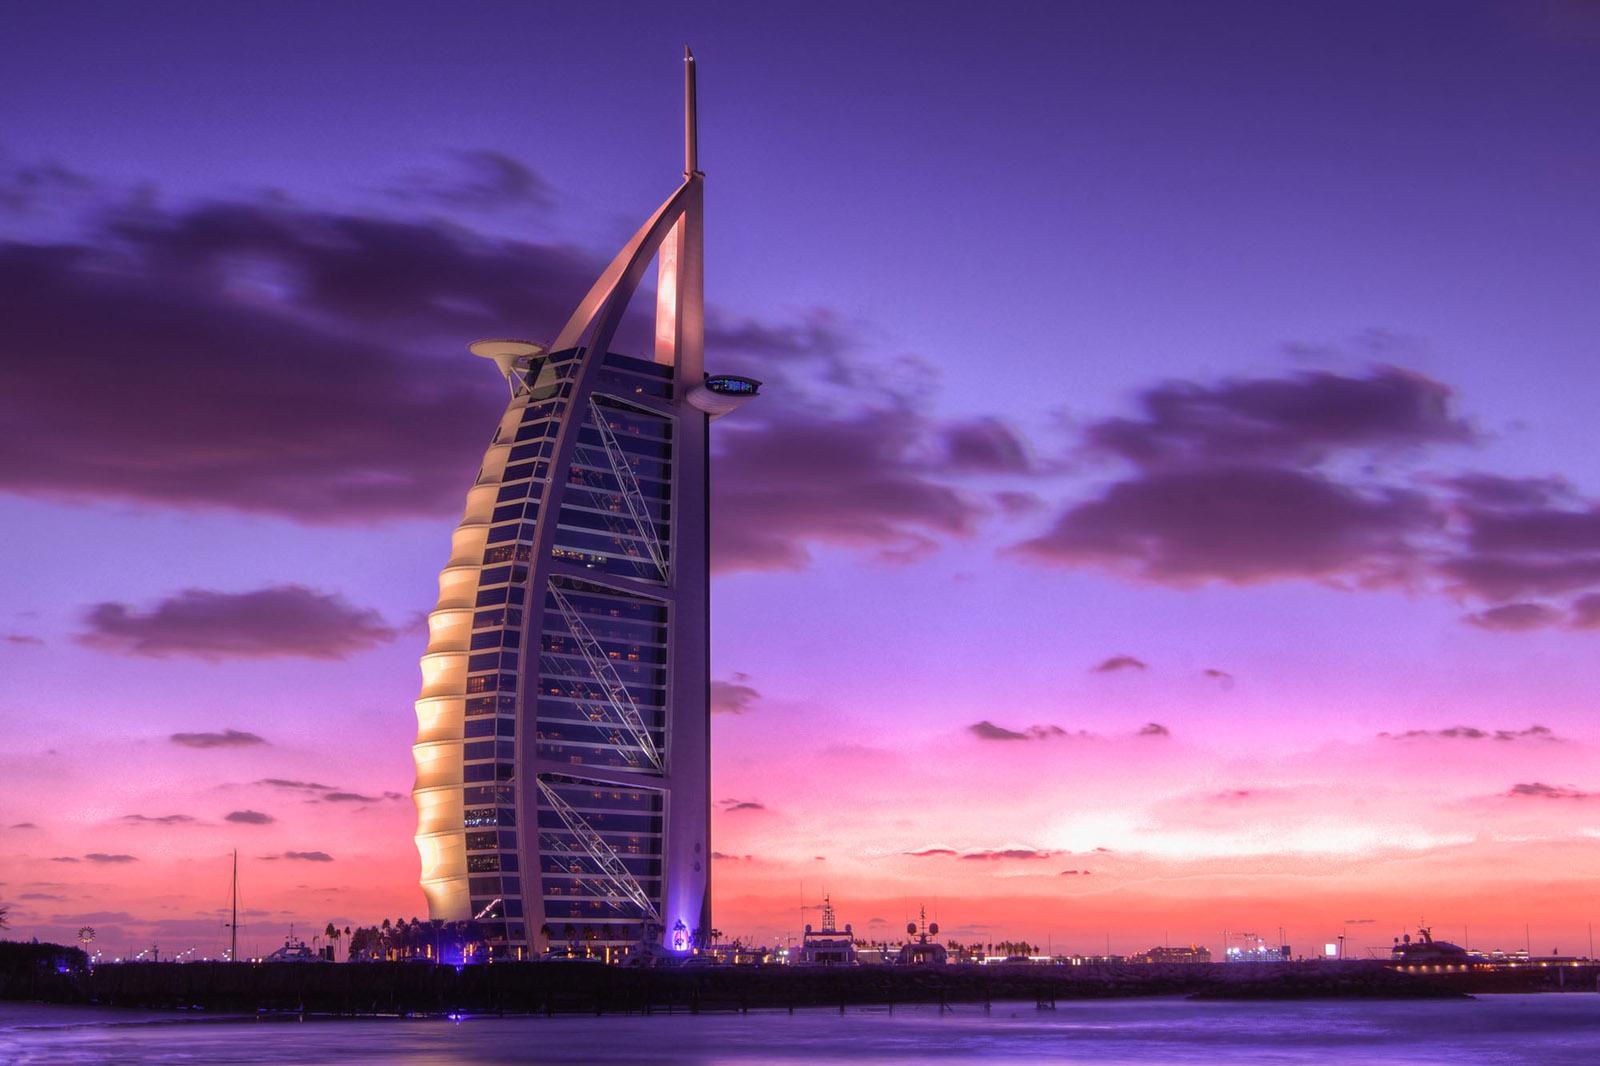 Гостиница Бурдж Аль-Араб